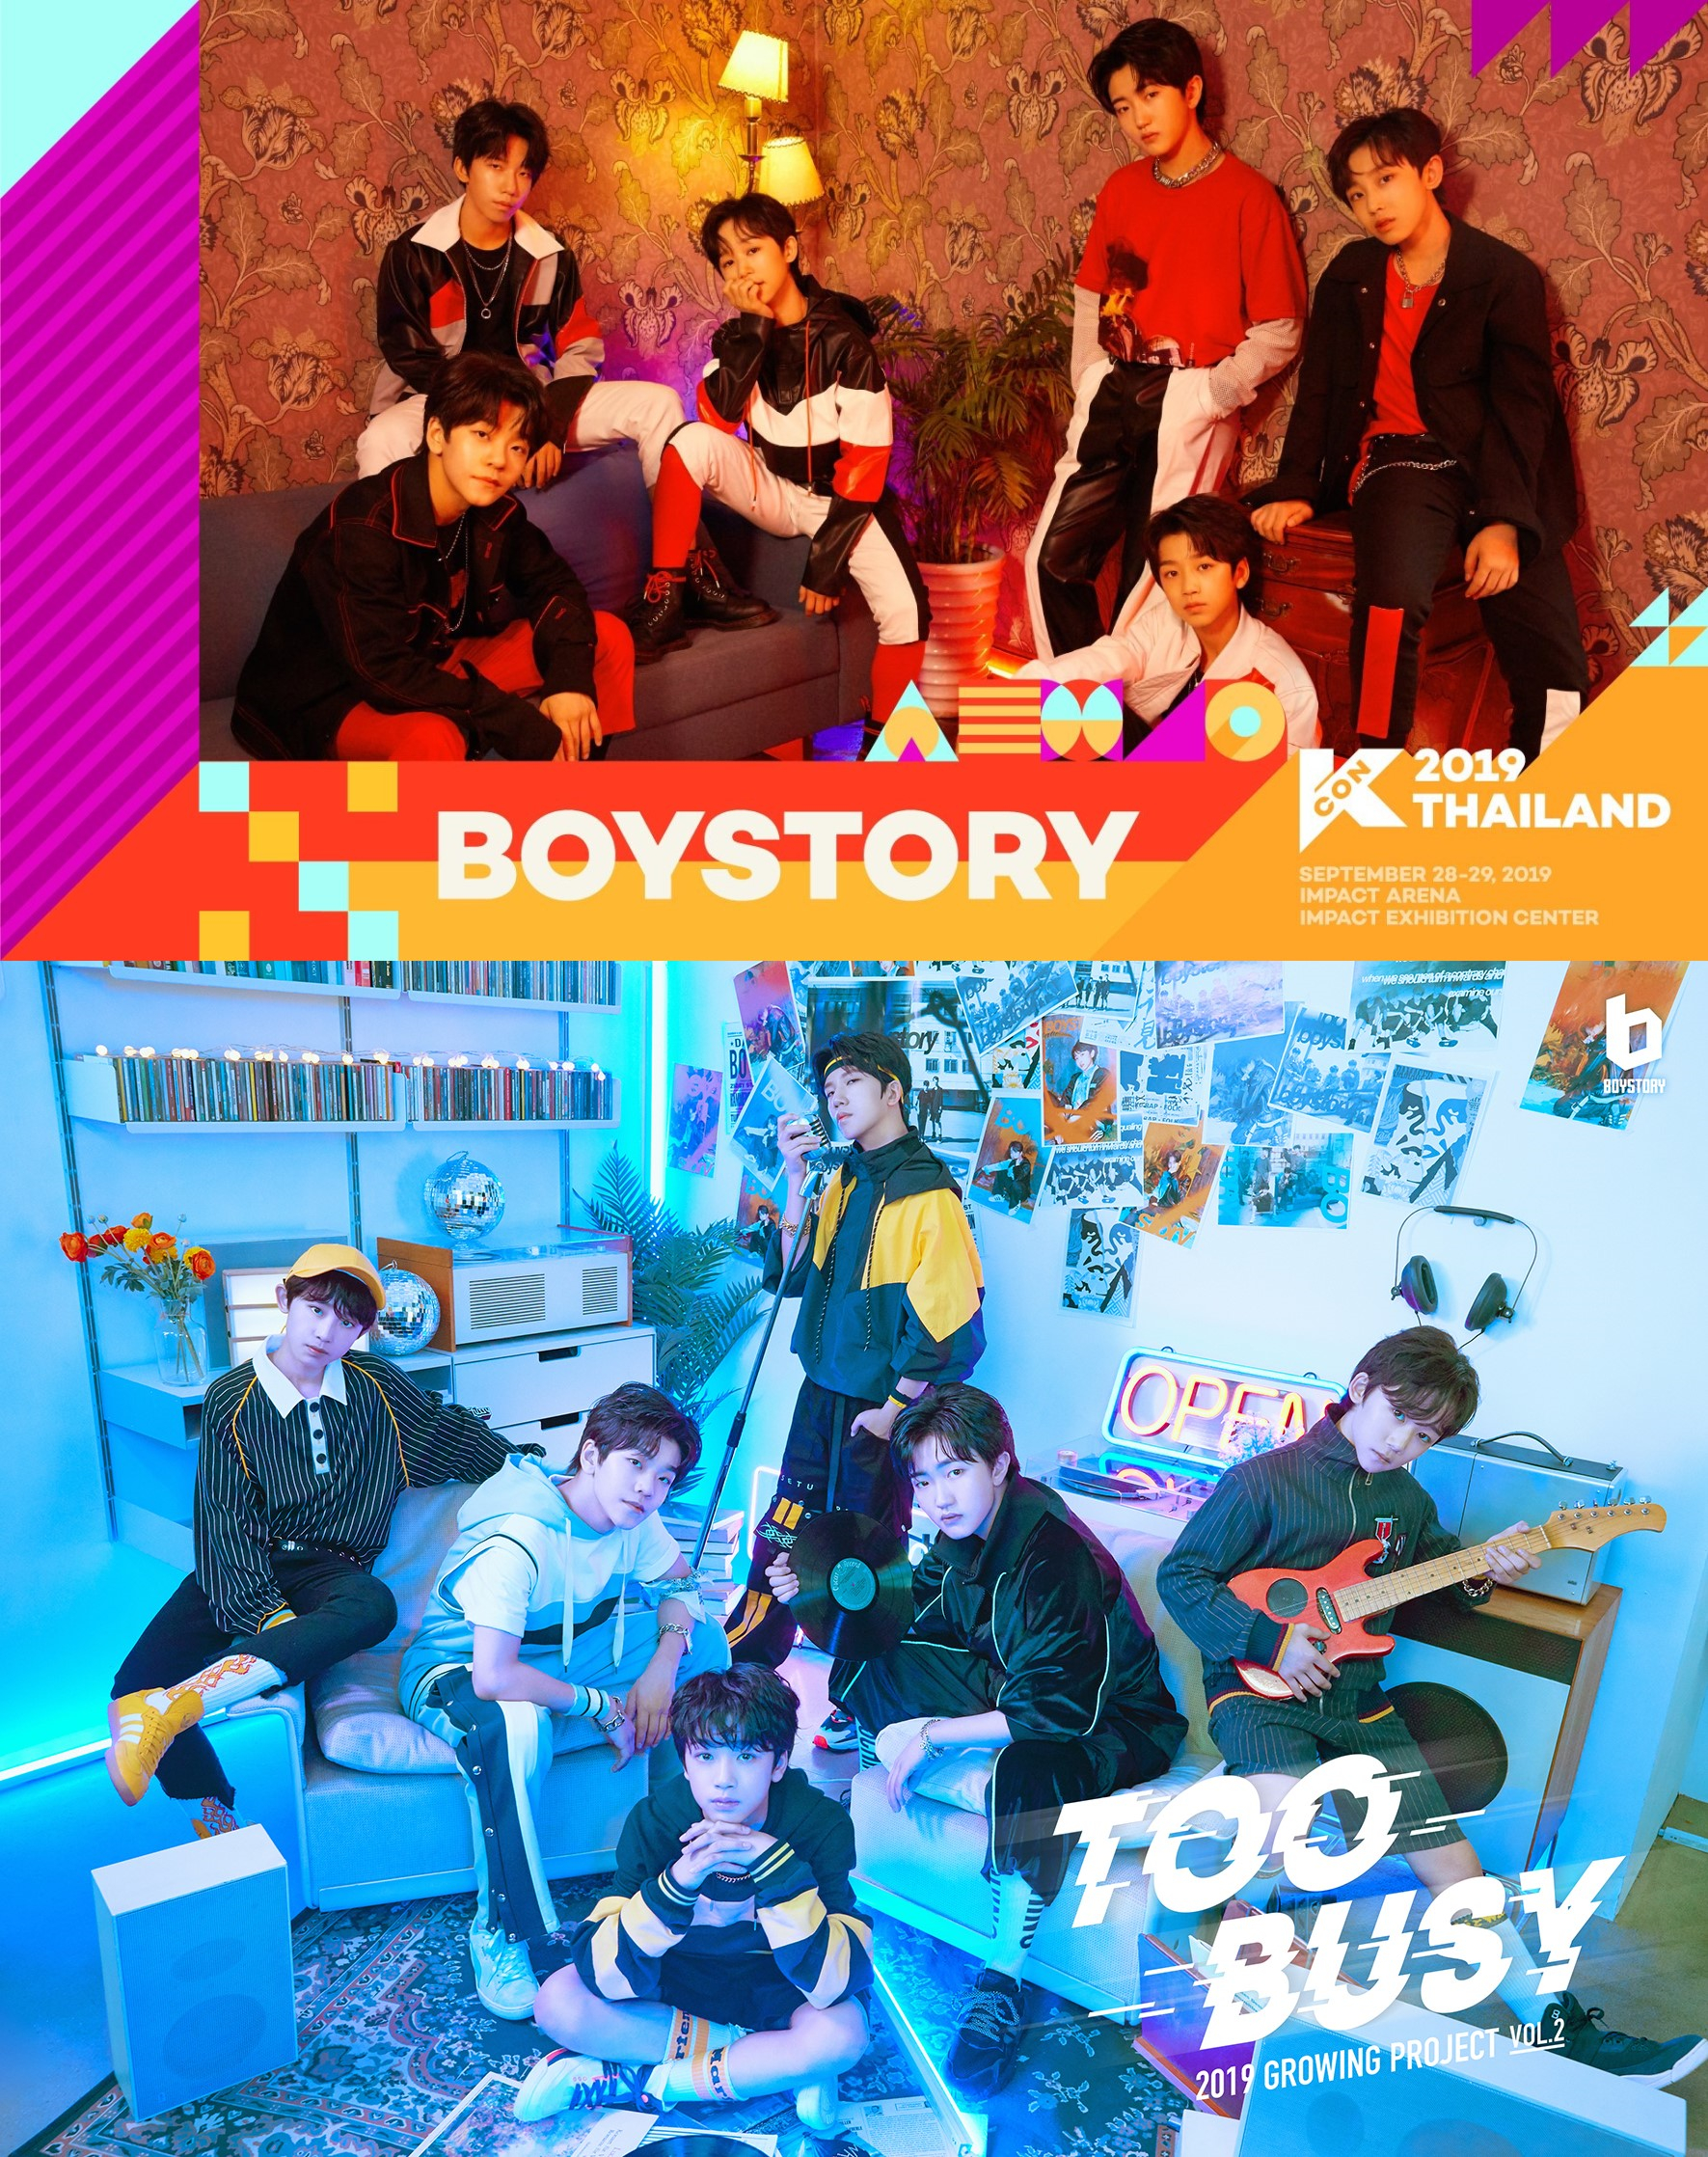 <b>JYP中国组合BOY STORY确定出演KCON 2019 THAILAND</b>